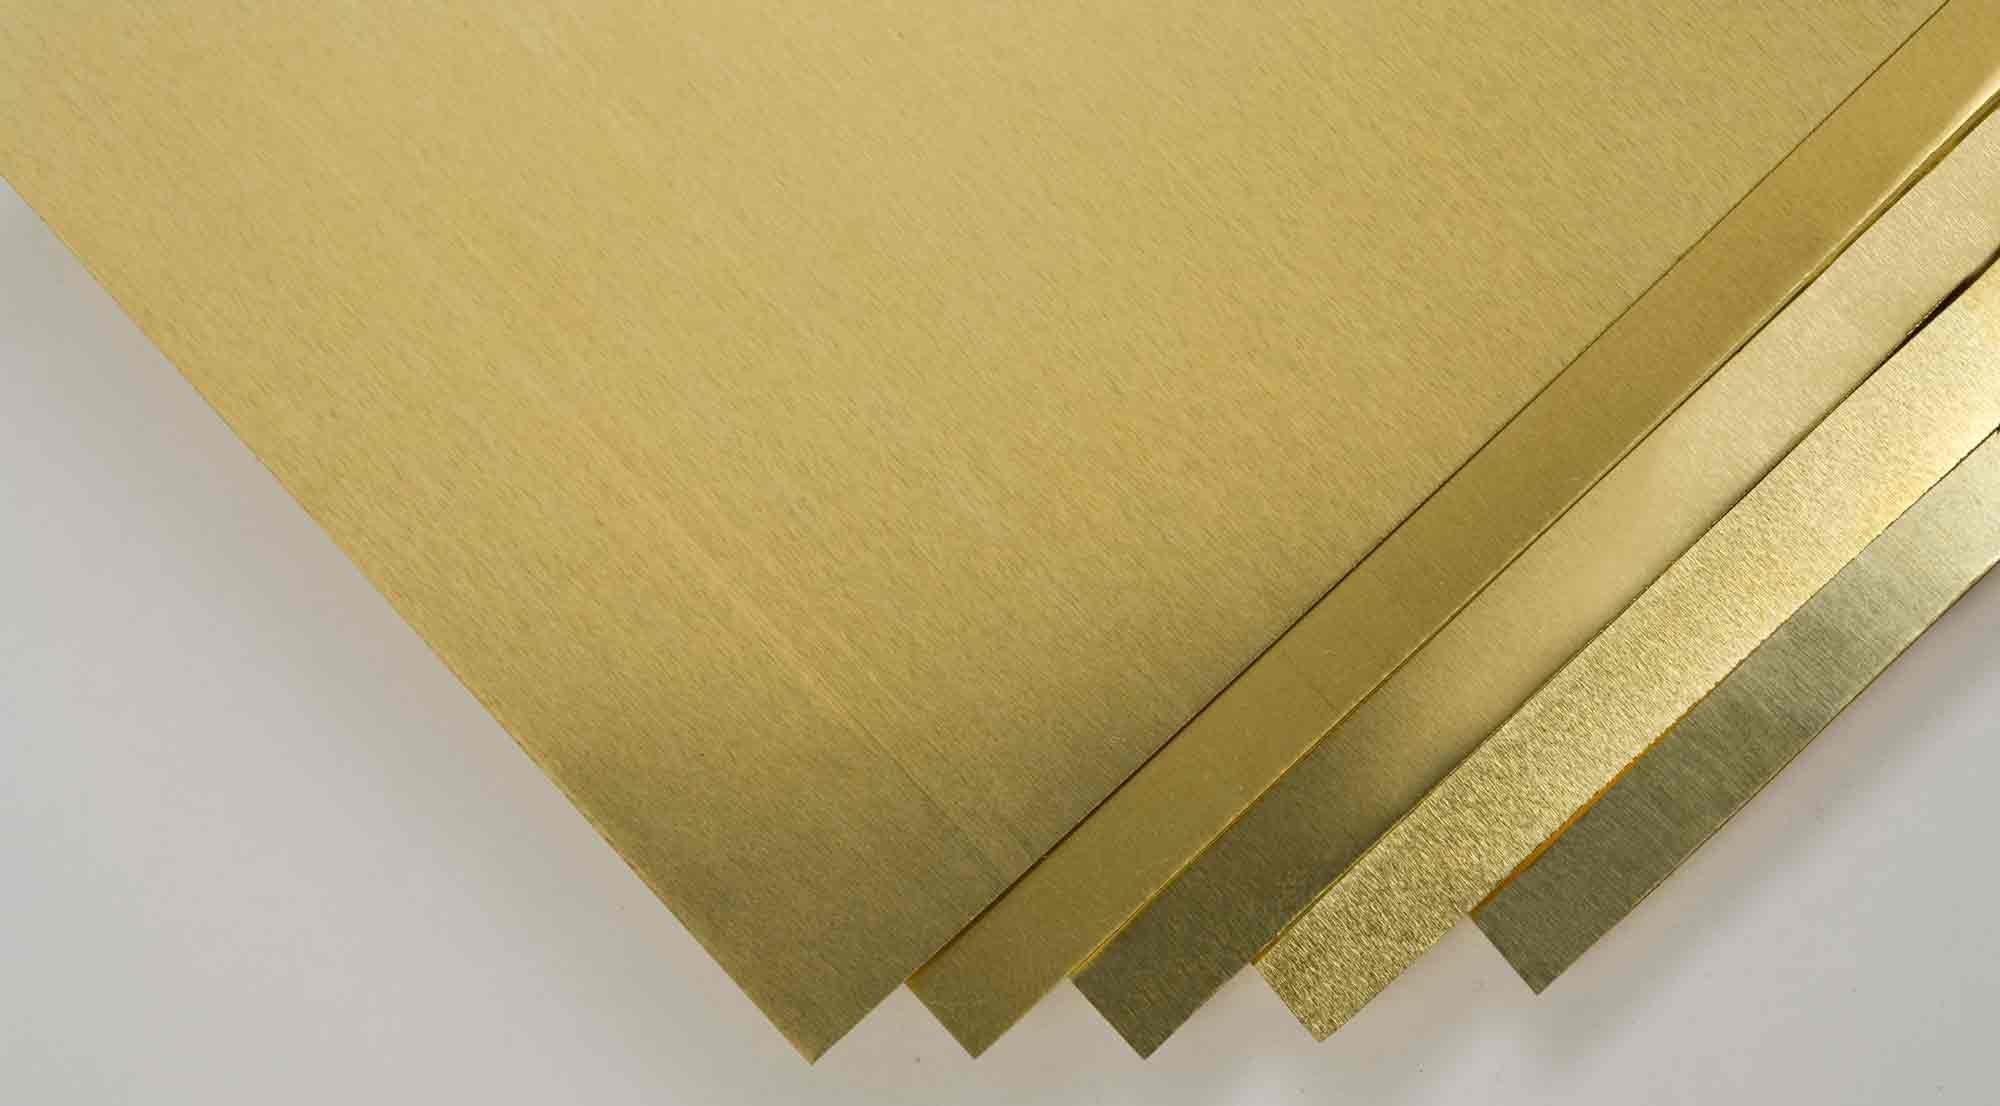 Shim Stock Assortment-Brass (5) by Goodson